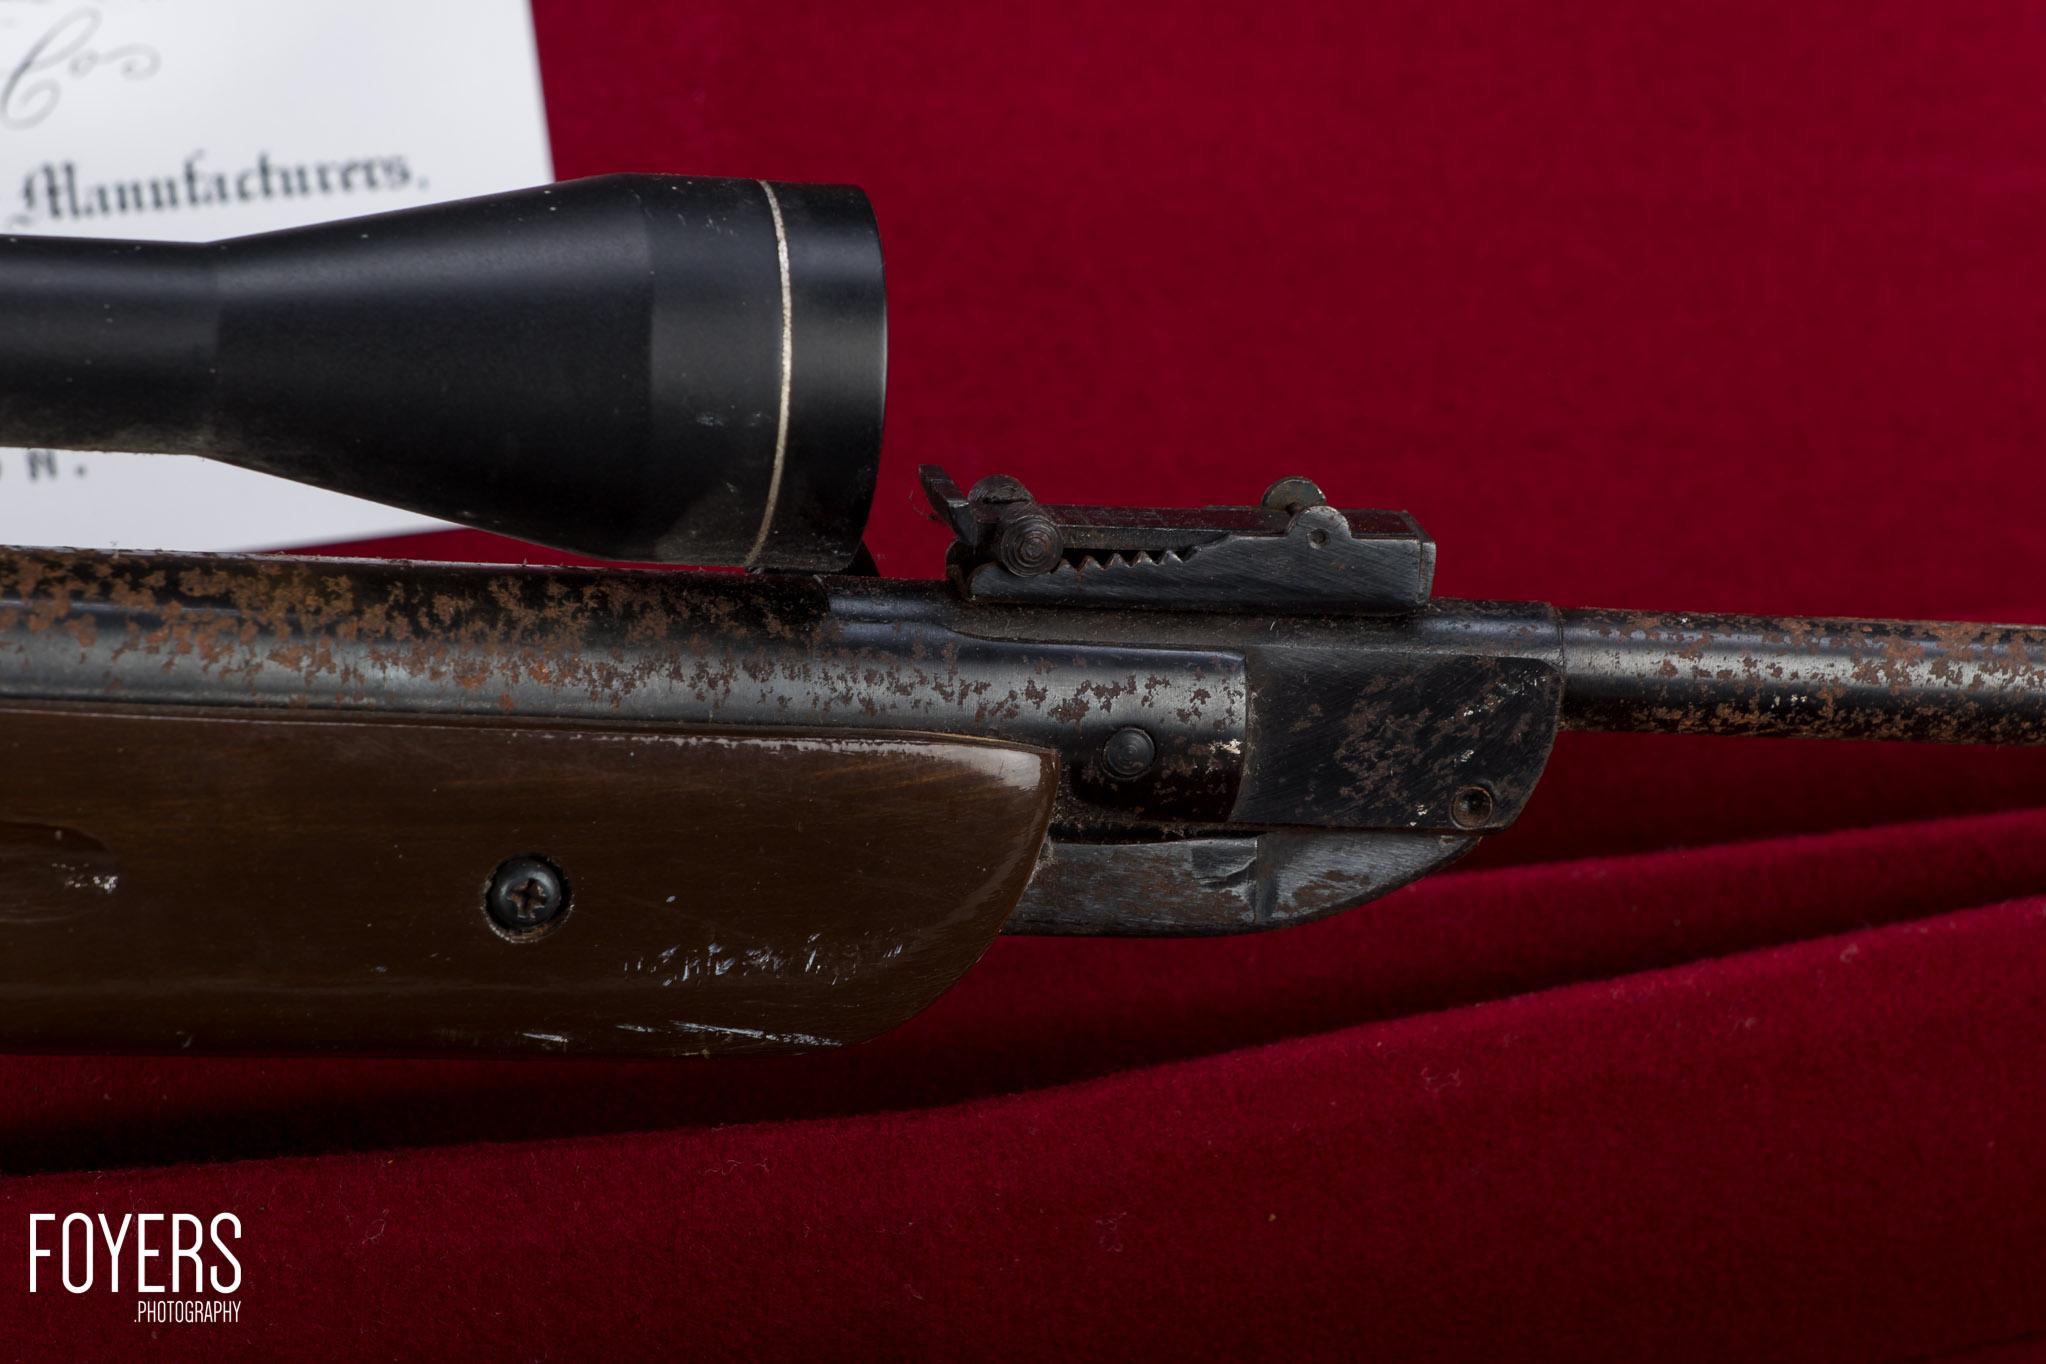 air rifle on gun case-3 - copyright Robert Foyers